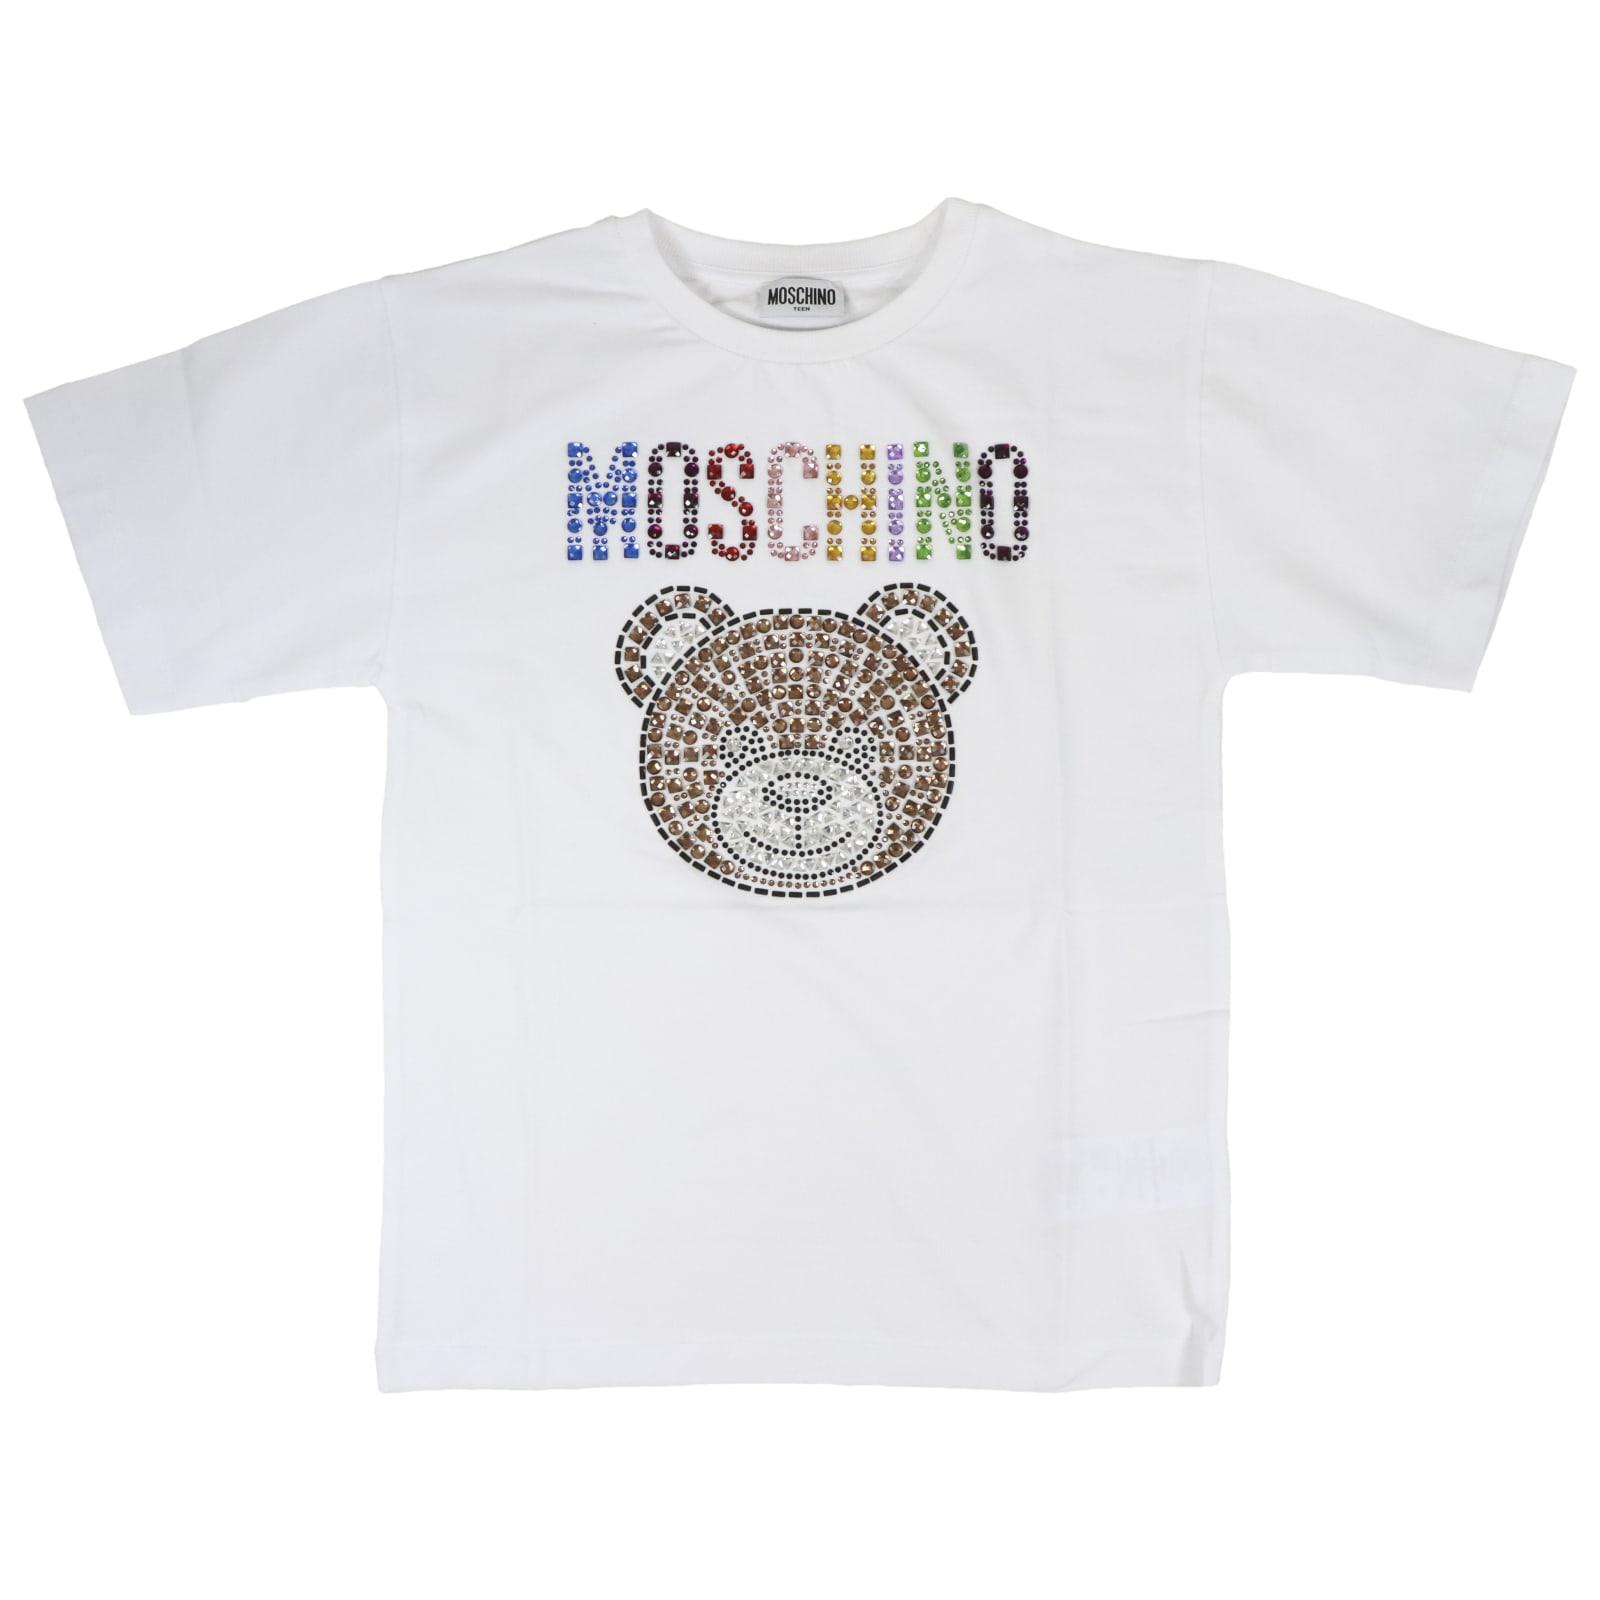 Moschino COTTON TOP-WEAR